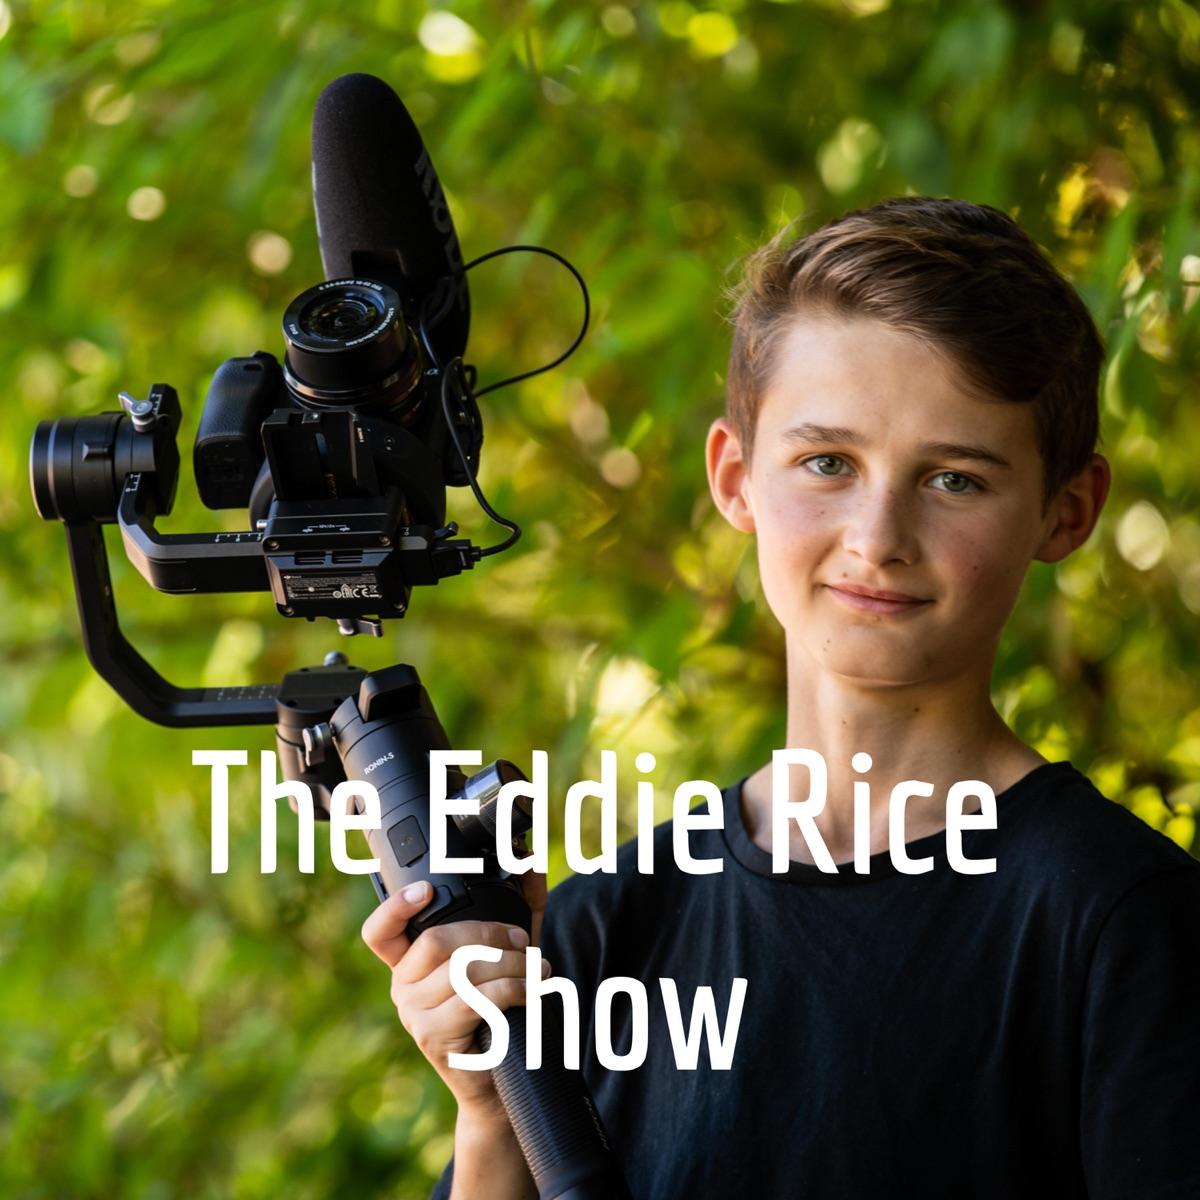 The Eddie Rice Show